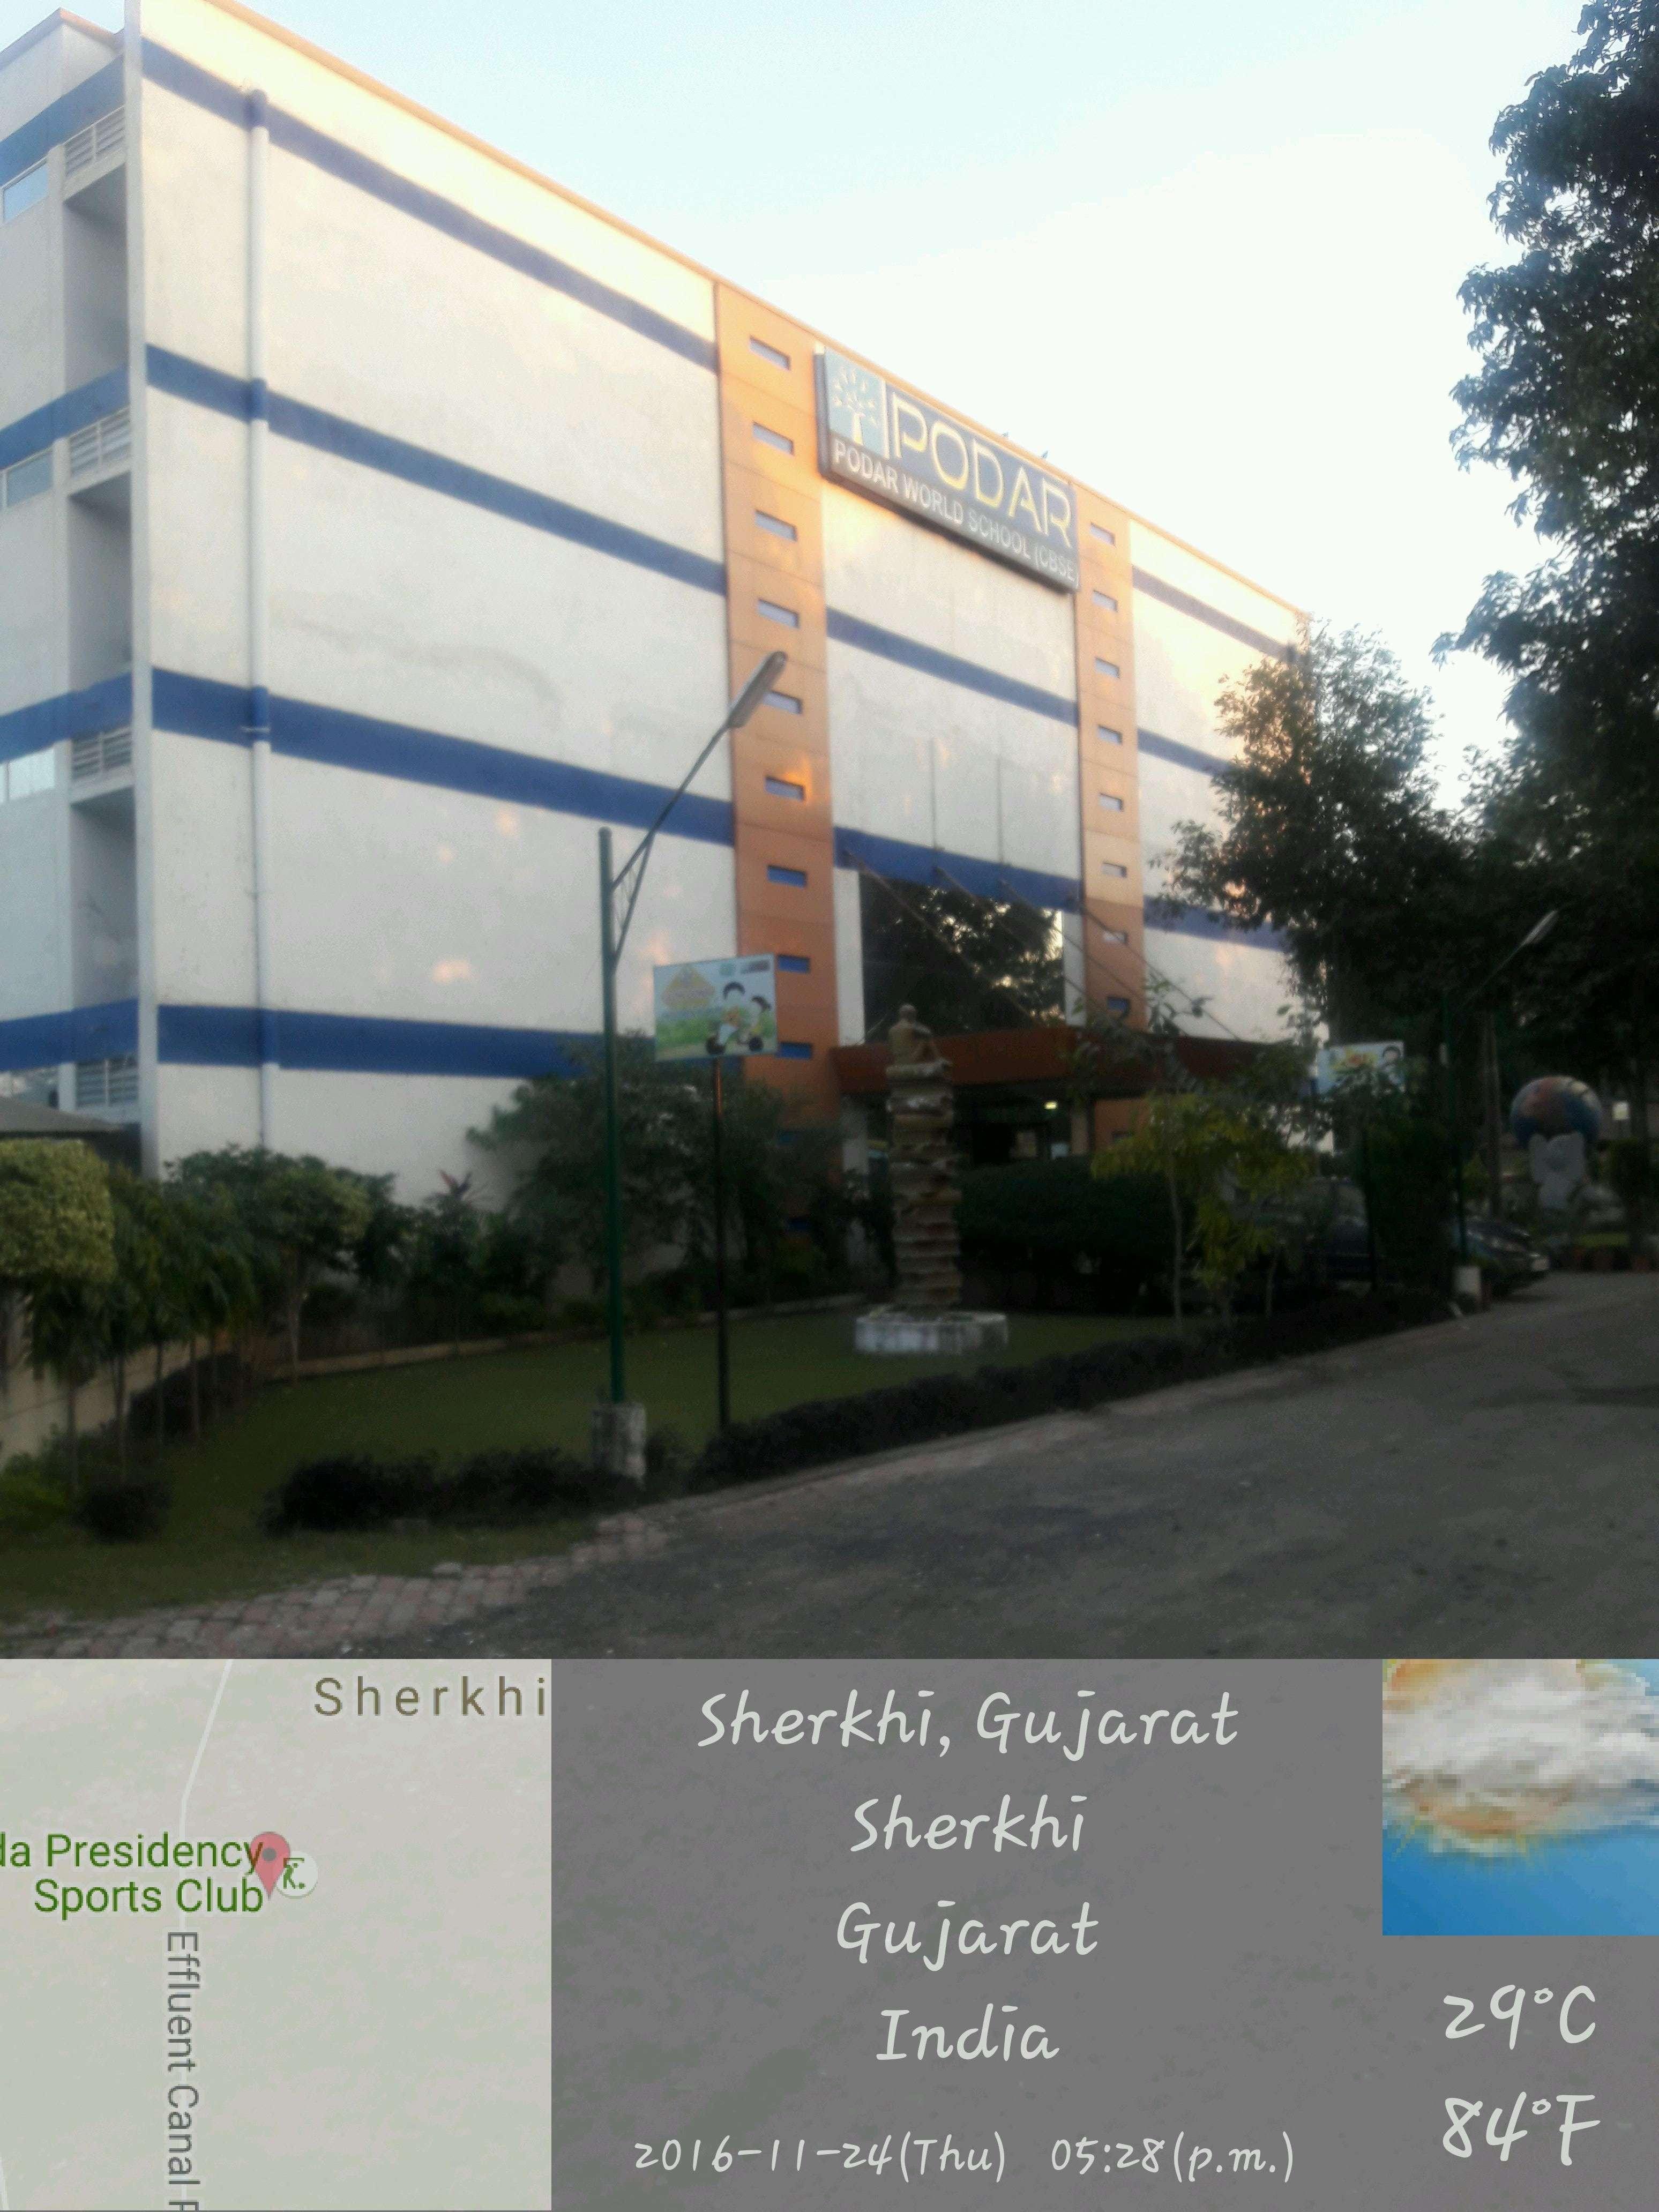 Podar World School Vadodara Bhimpura Koyali channel road Opp bapu nagar bus stand Near Chandan Multiplex Sherki 430182